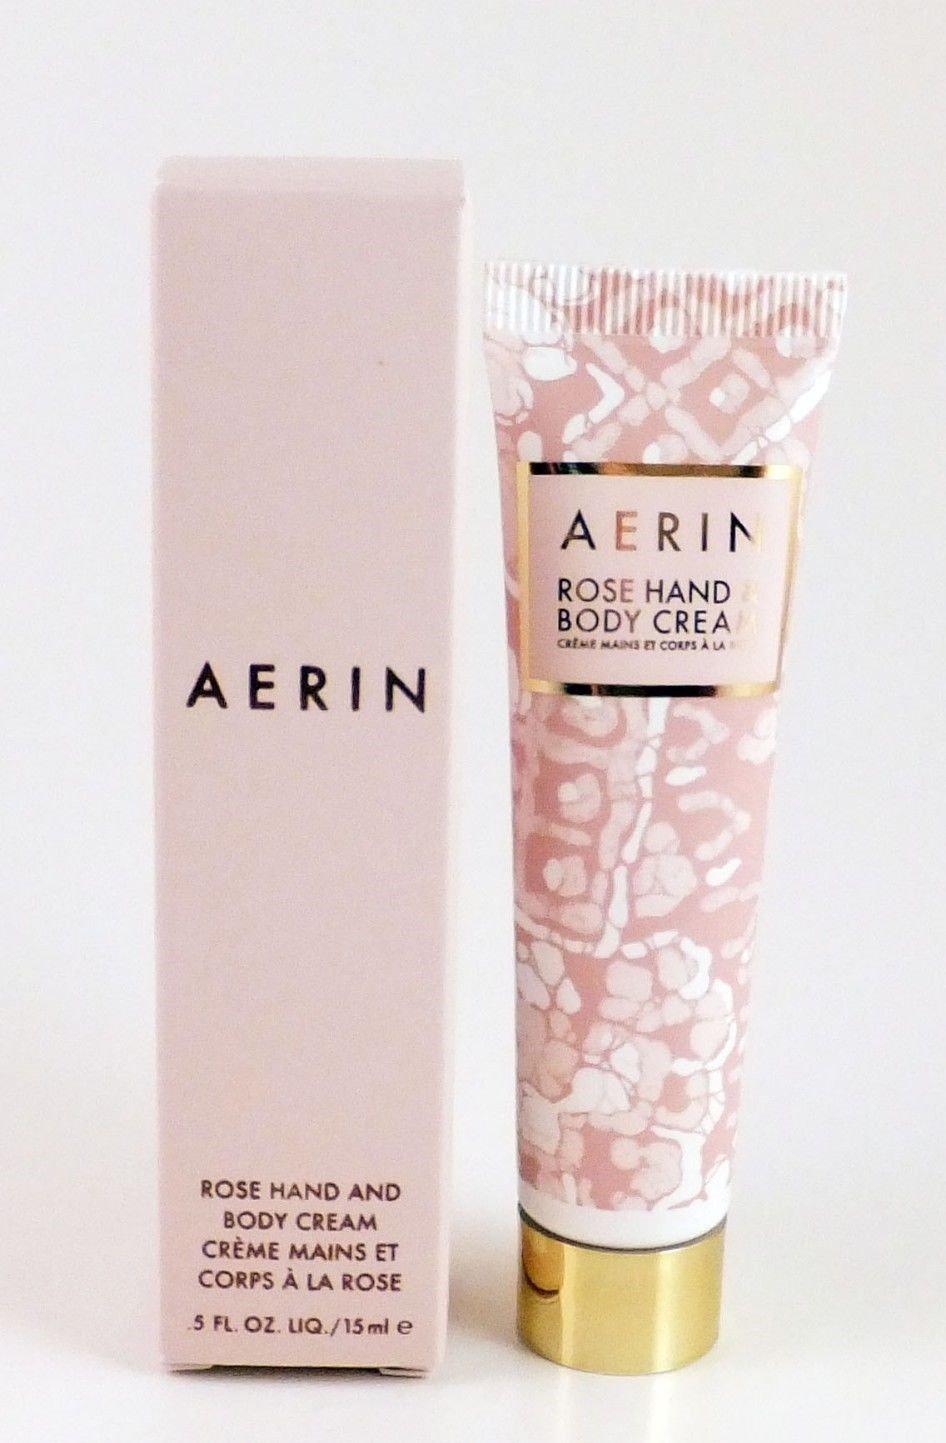 Aerin Rose Hand & Body Cream 0.5 oz - Deluxe Travel Size